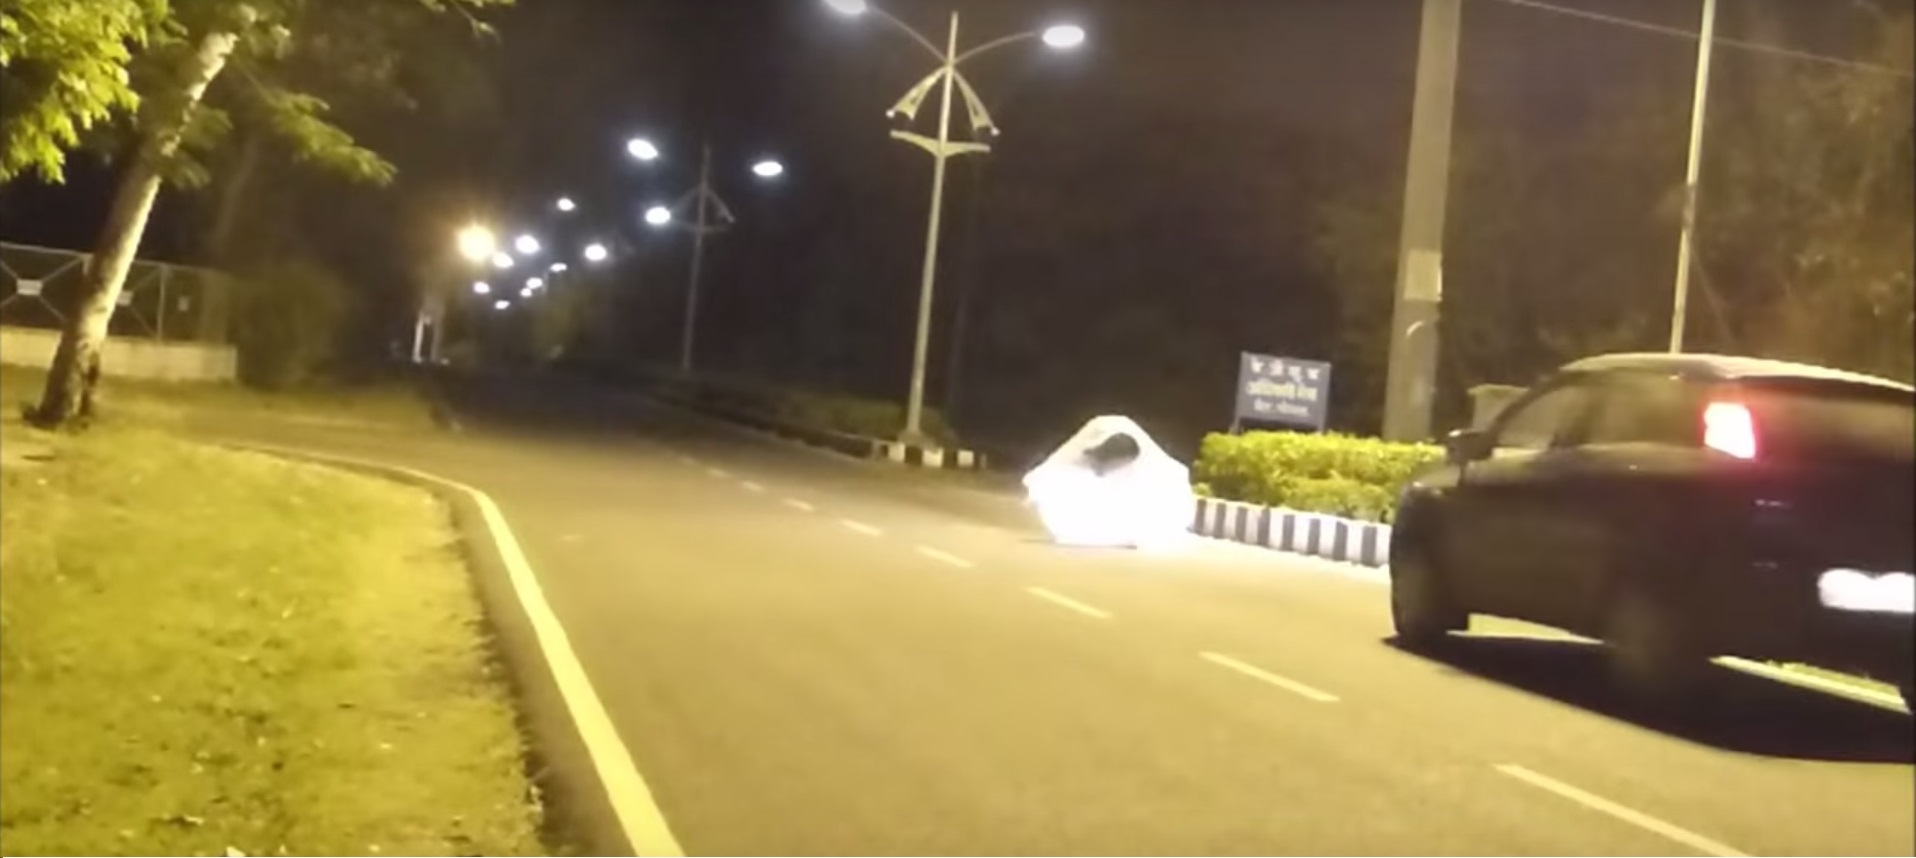 Ghost prank gone horribly wrong; driver knocks down prankster